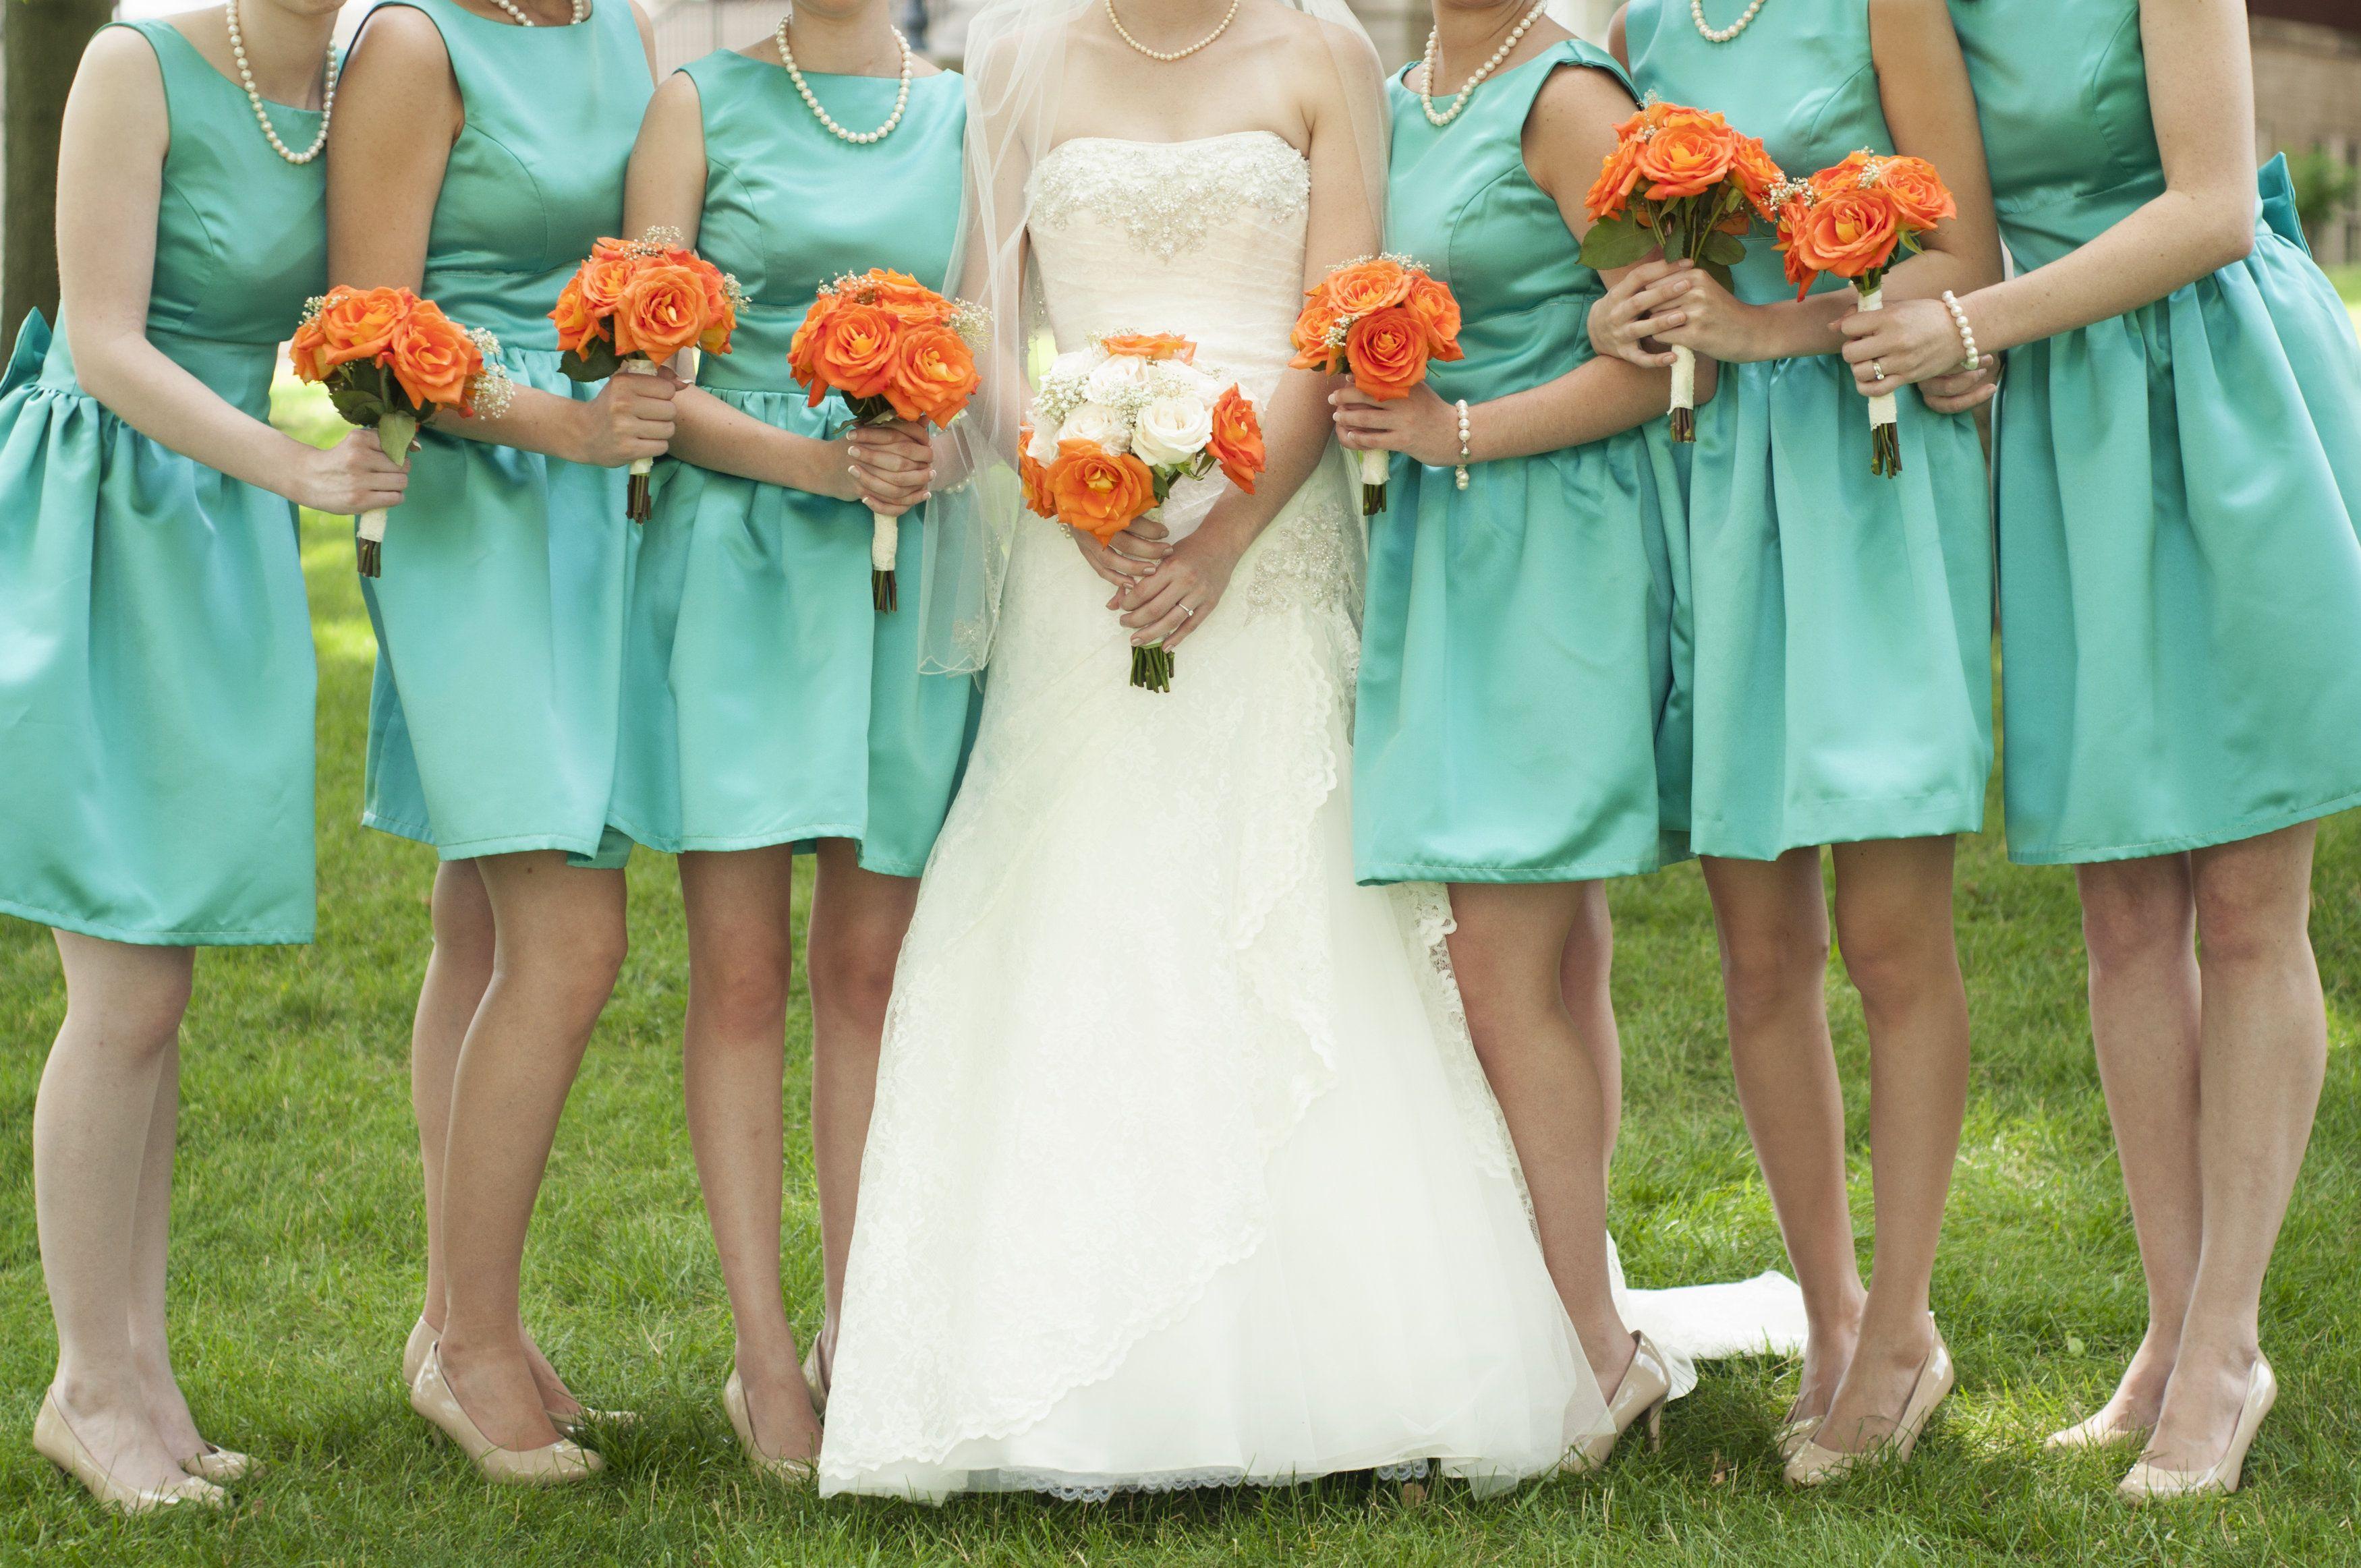 Black Bridesmaid Dress, Audrey Hepburn Dress, Custom Size | Teal ...